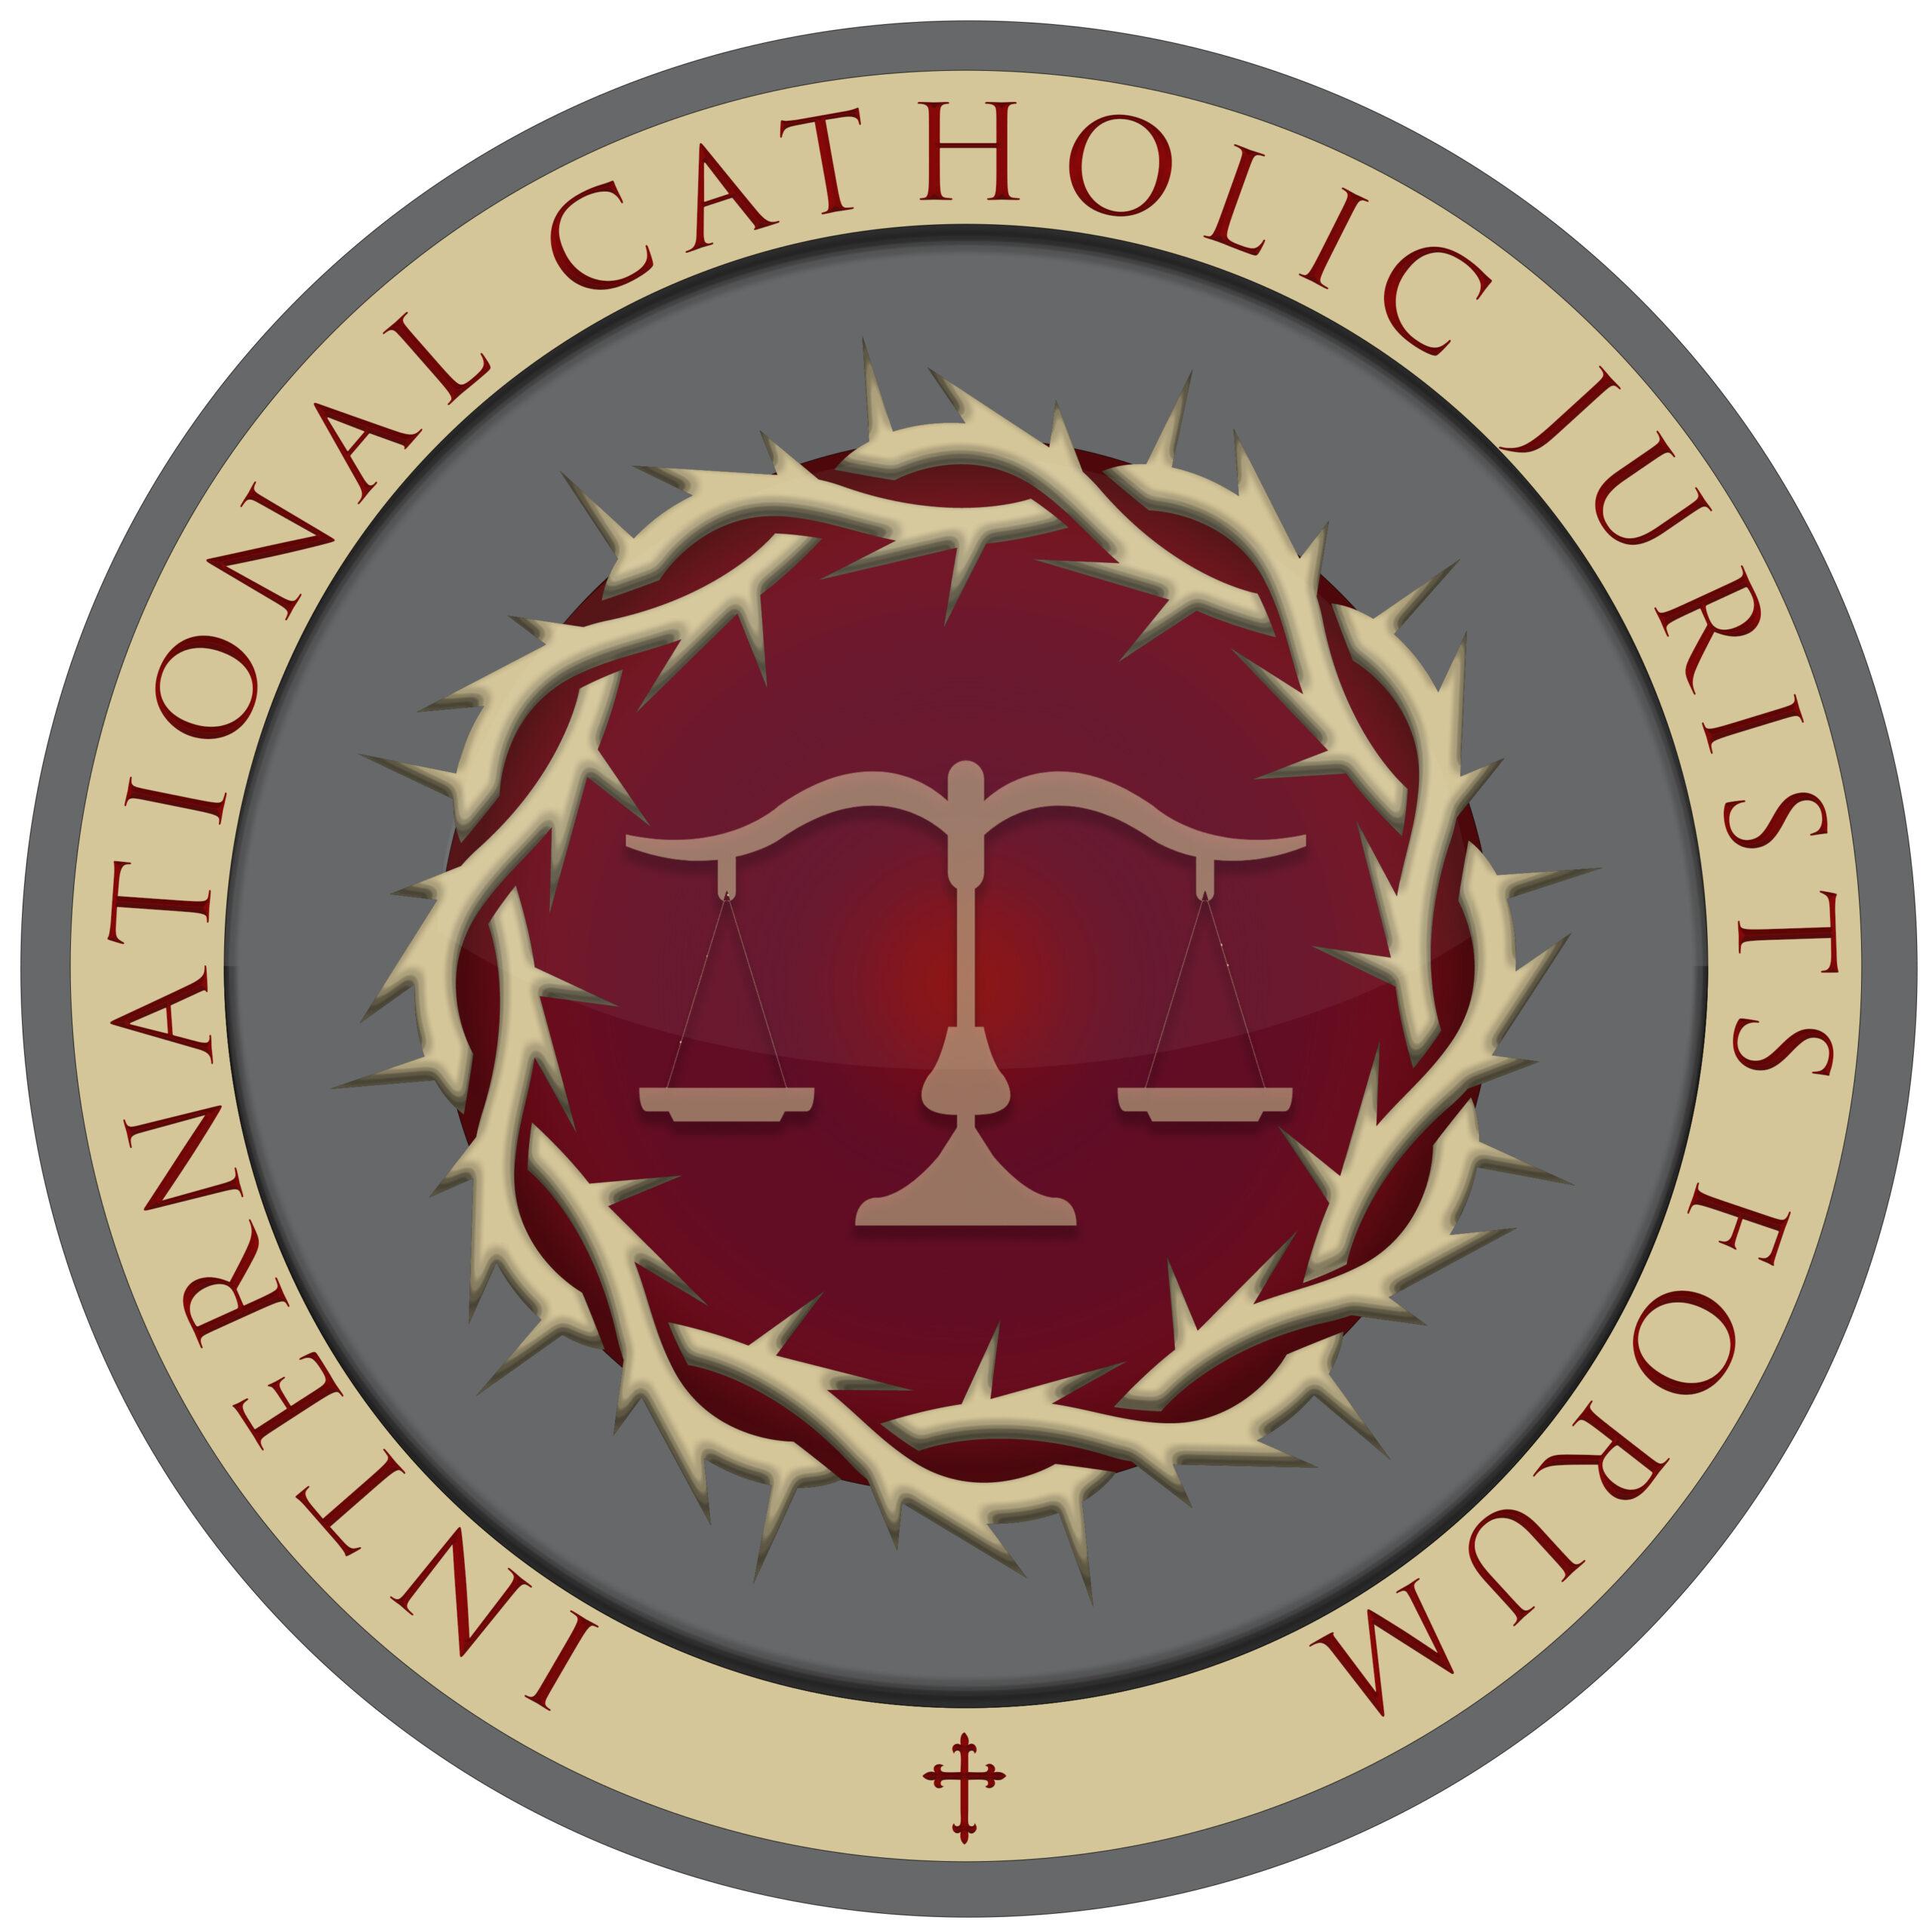 International Catholic Jurists Forum